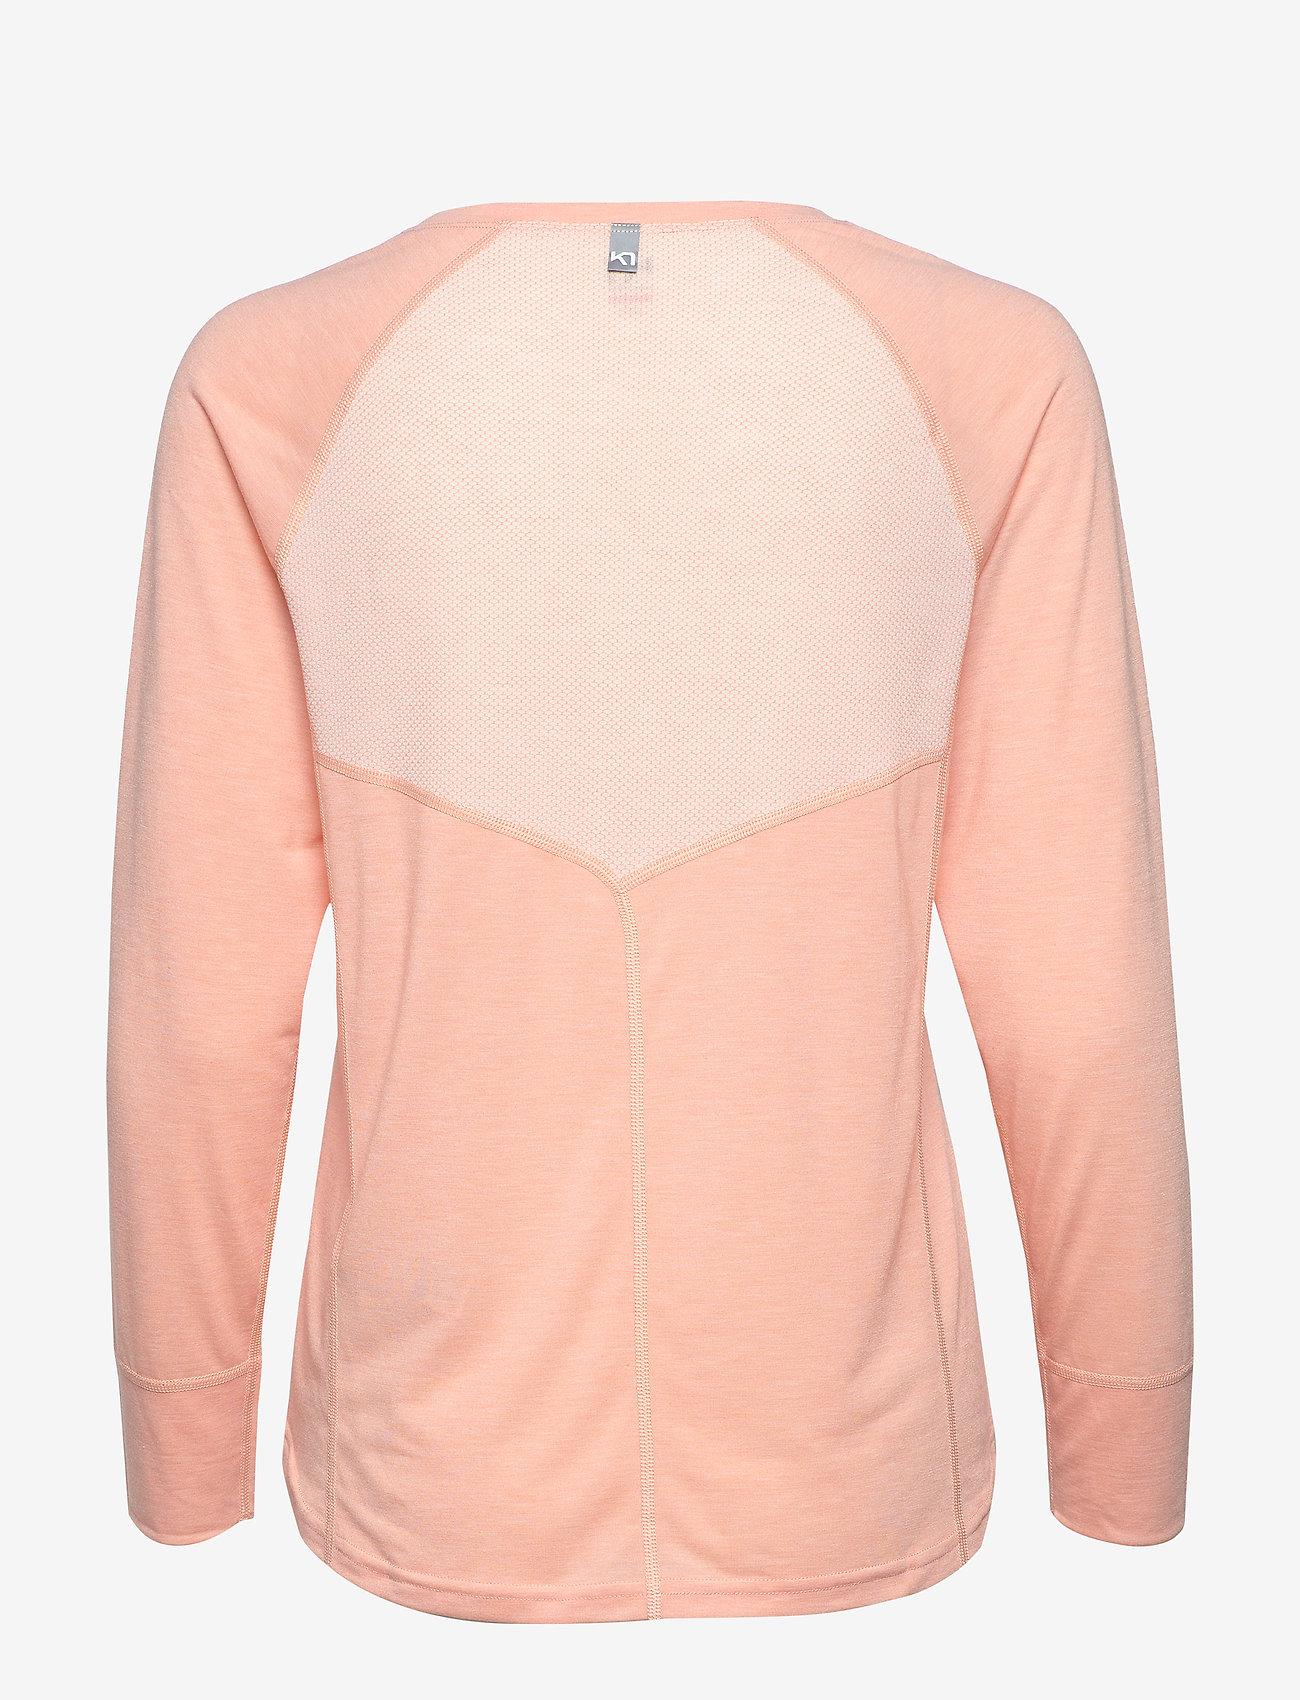 Kari Traa - MARIA LS - bluzki z długim rękawem - salma - 1